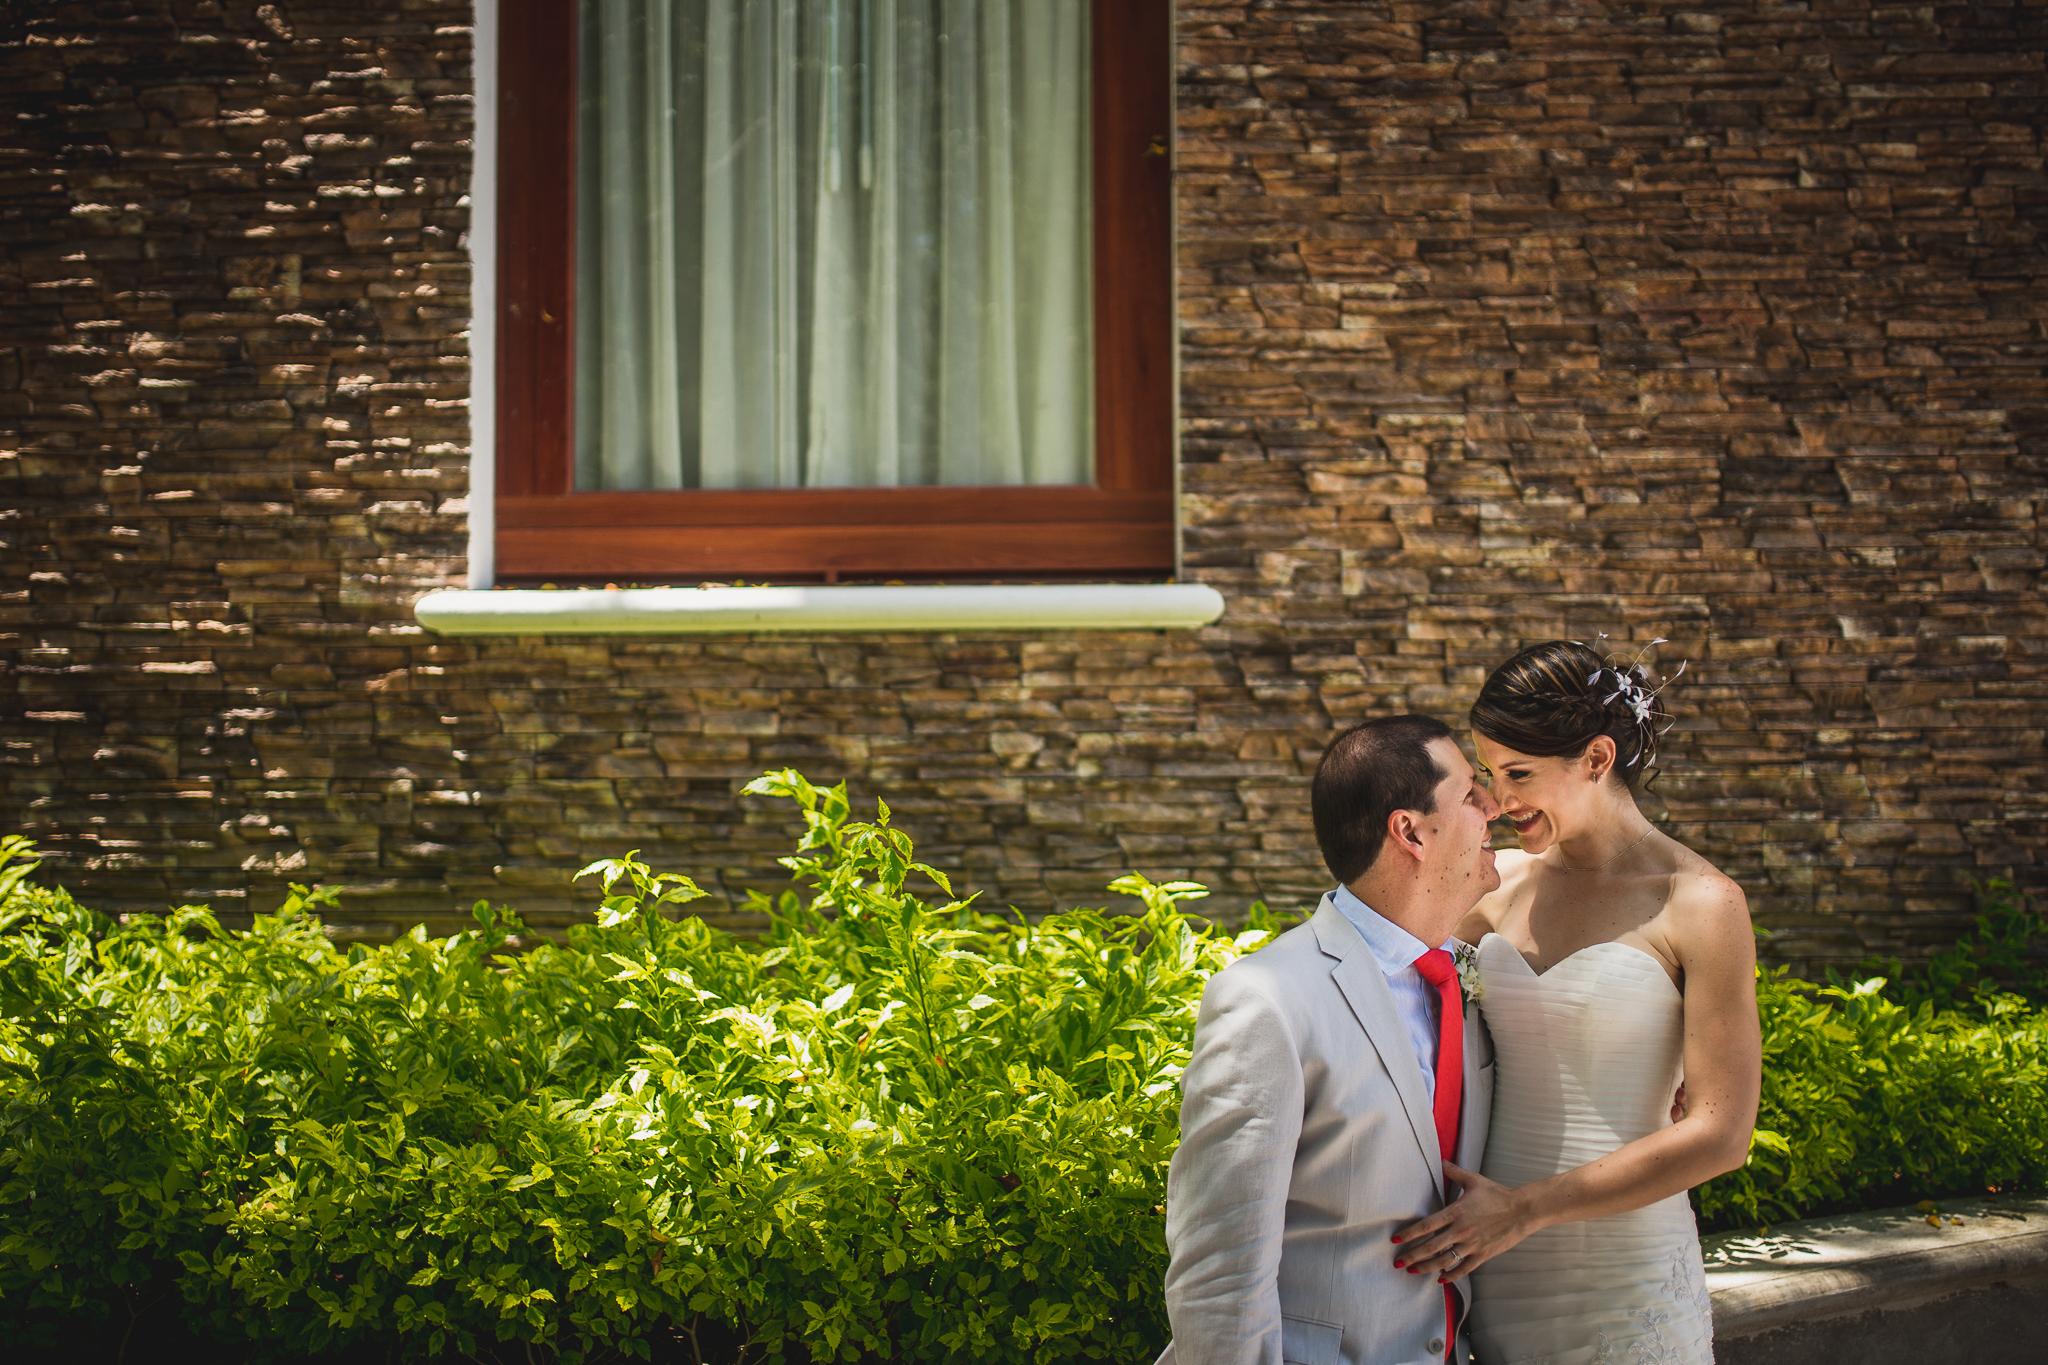 wedding-photography-mexico-quinta-rubelinas-27.jpg